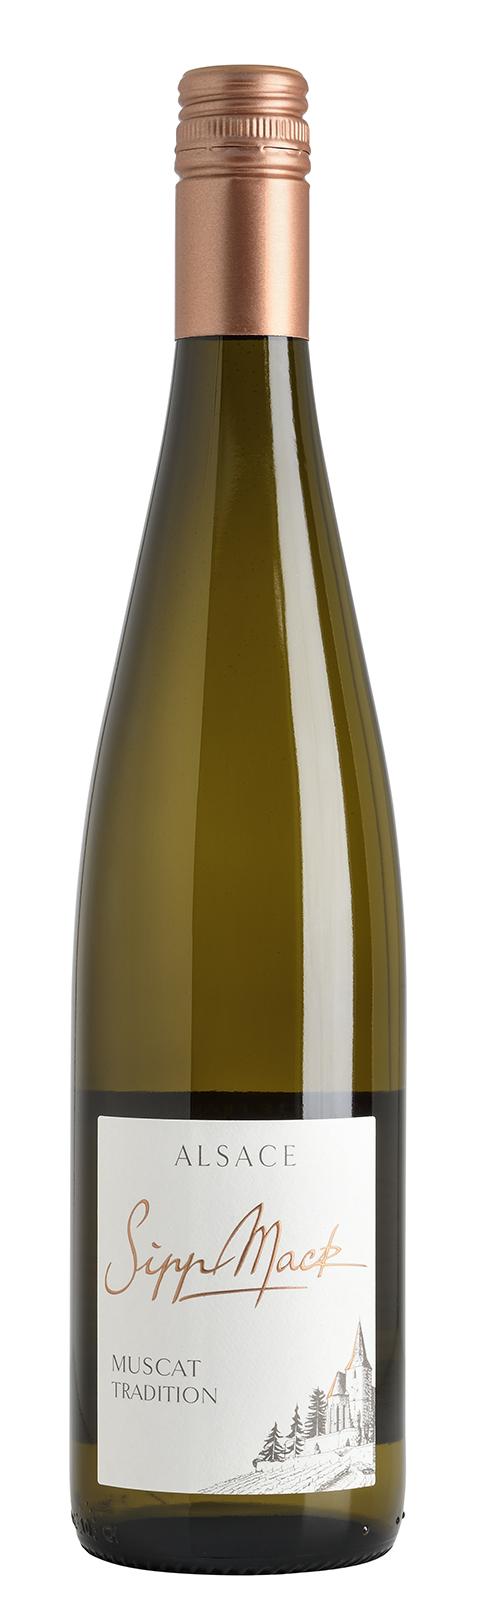 A fresh, aromatic, and elegant wine!